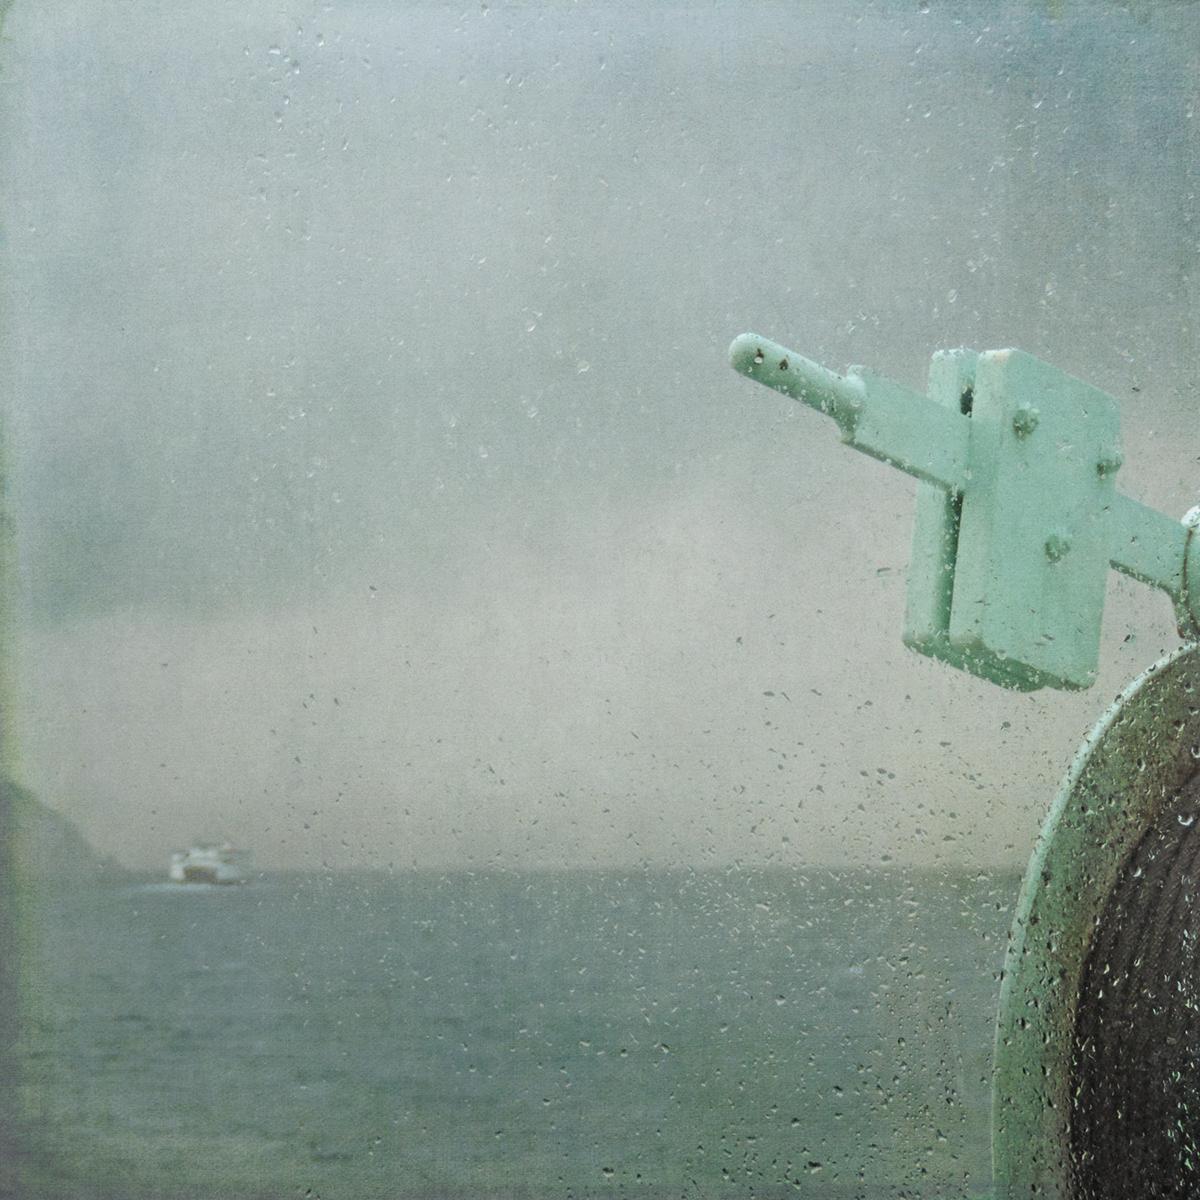 stormy rain rain on window seagulls seascape ferry Puget Sound Sally Banfill